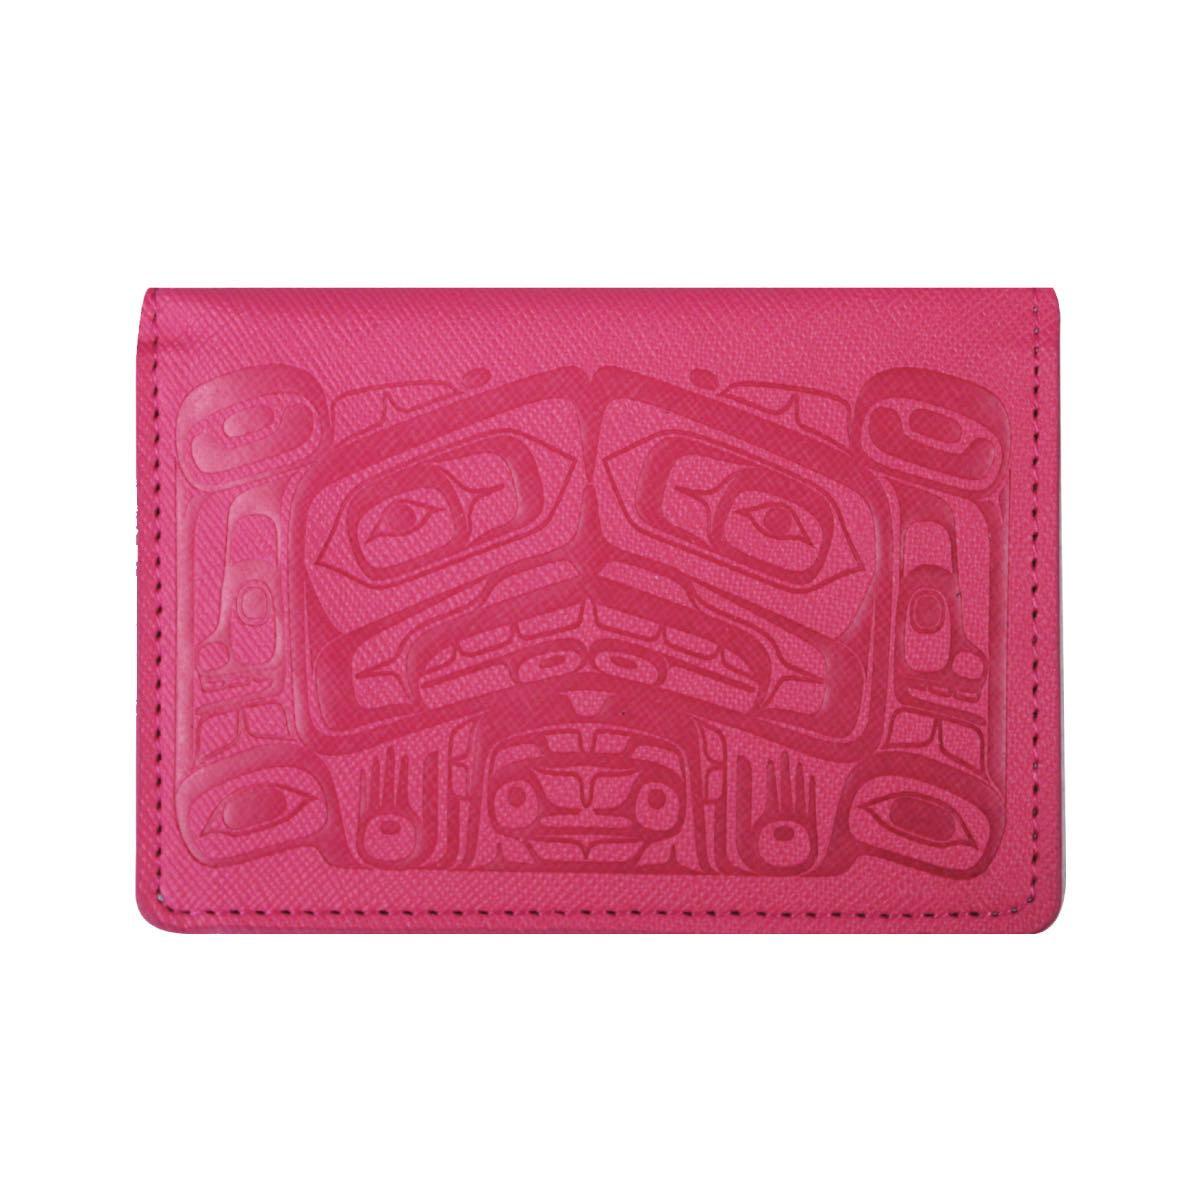 Card Wallet-Raven Box by Allan Weir-5